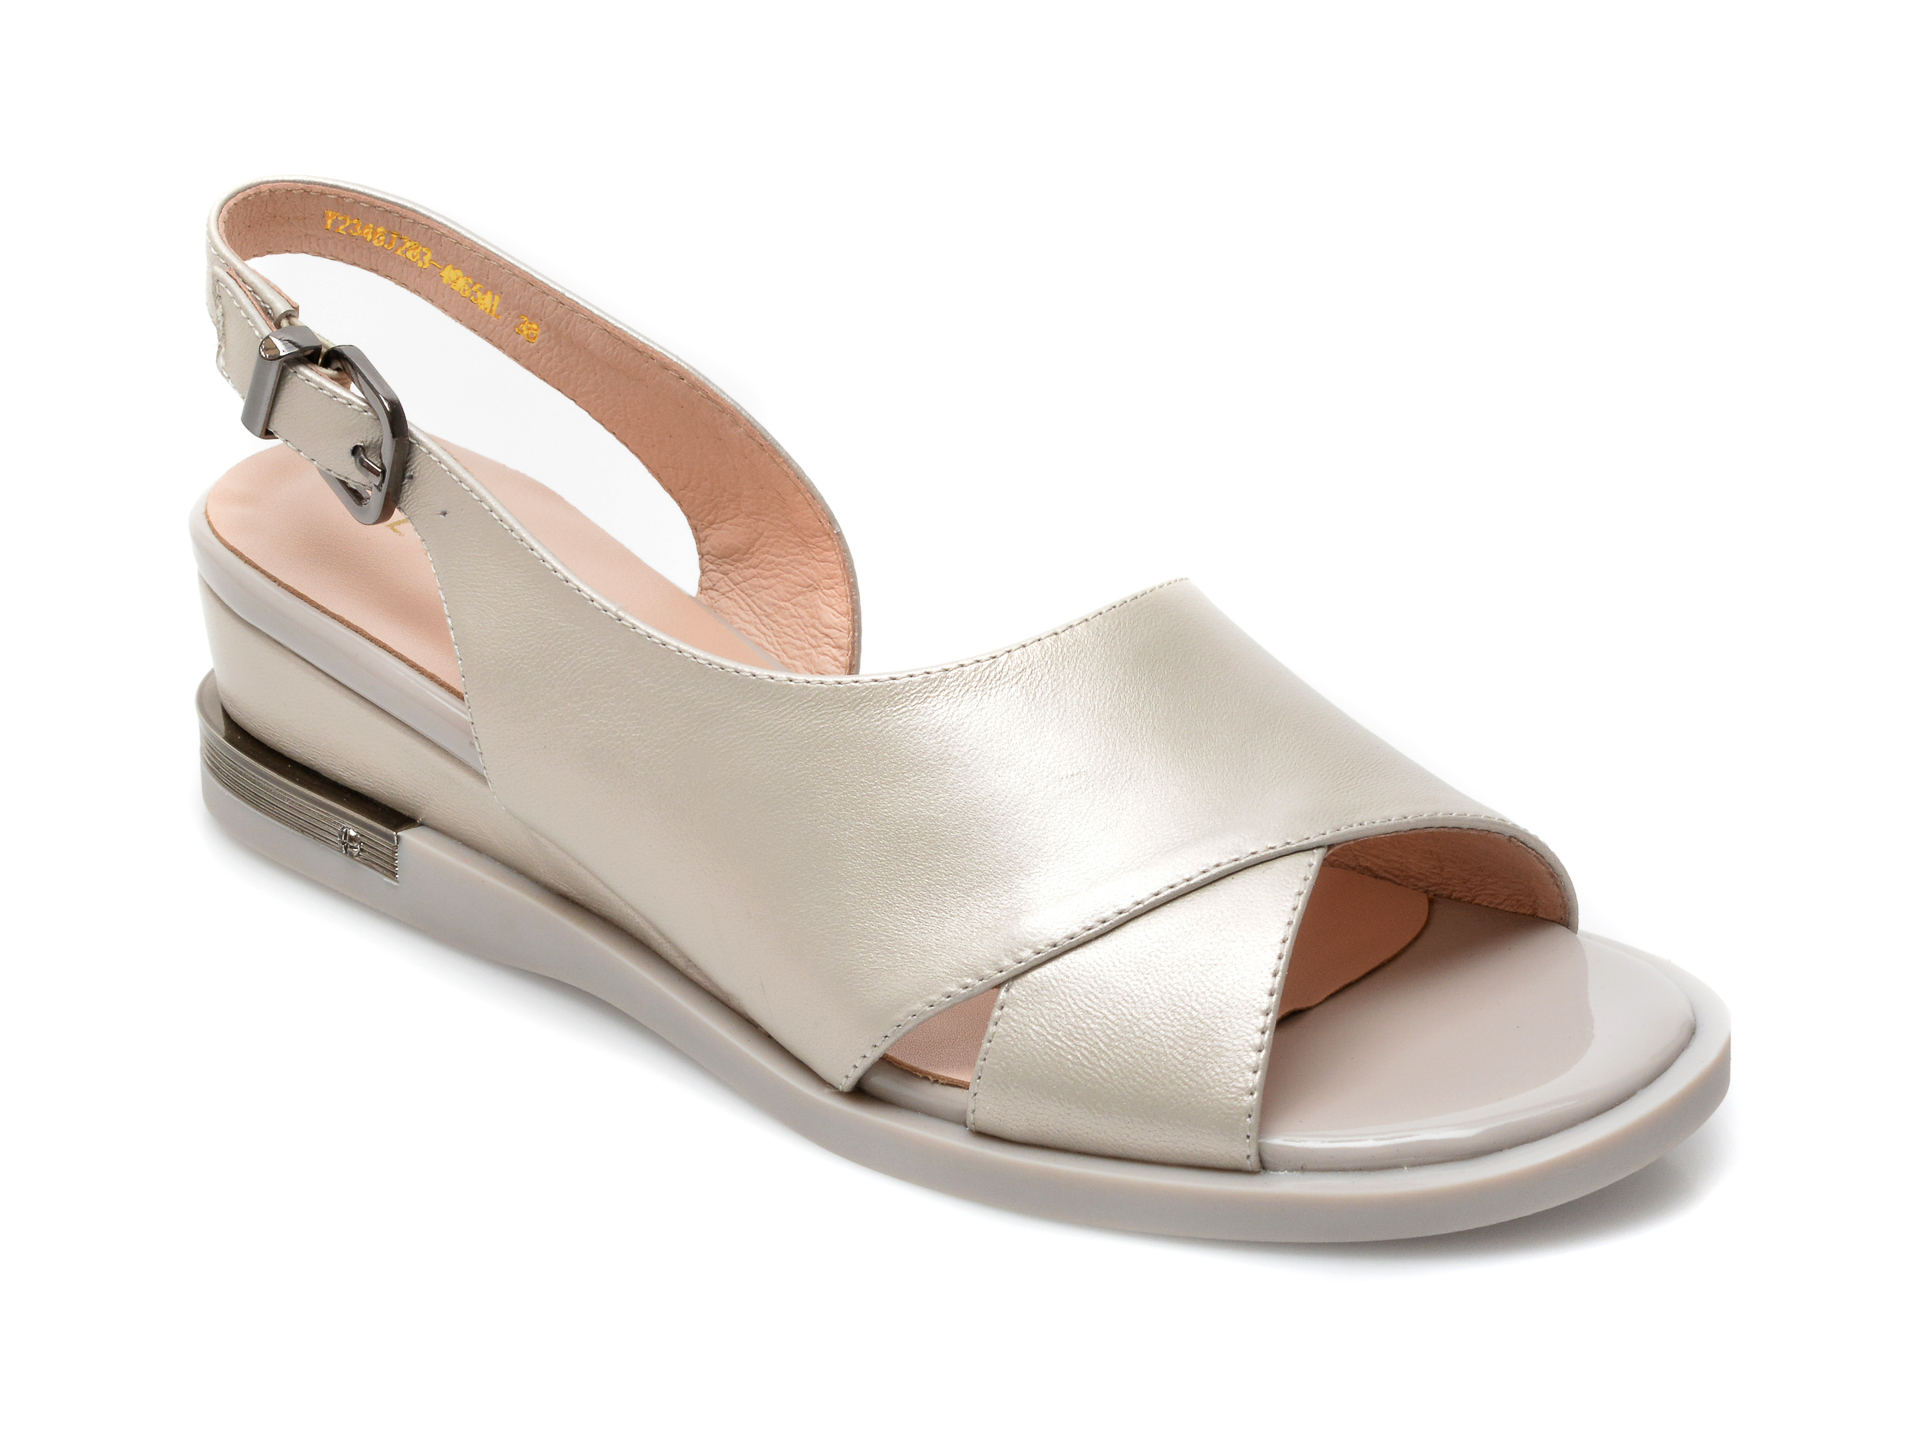 Sandale EPICA bej, Y2346J2, din piele naturala imagine otter.ro 2021